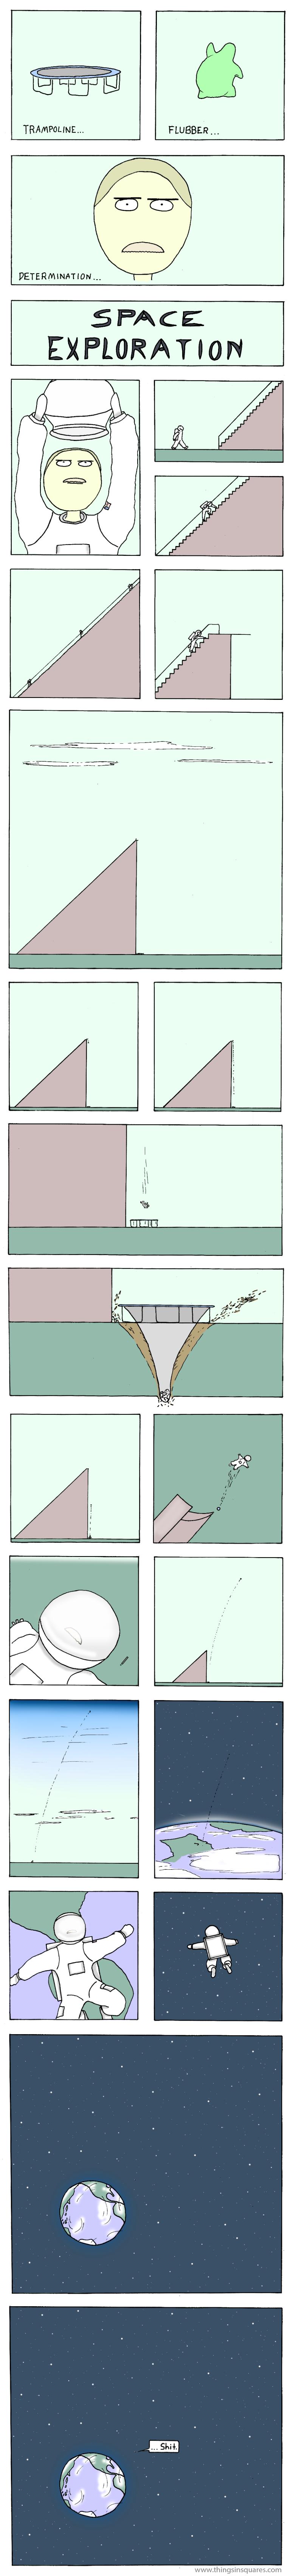 flubber-space-comic